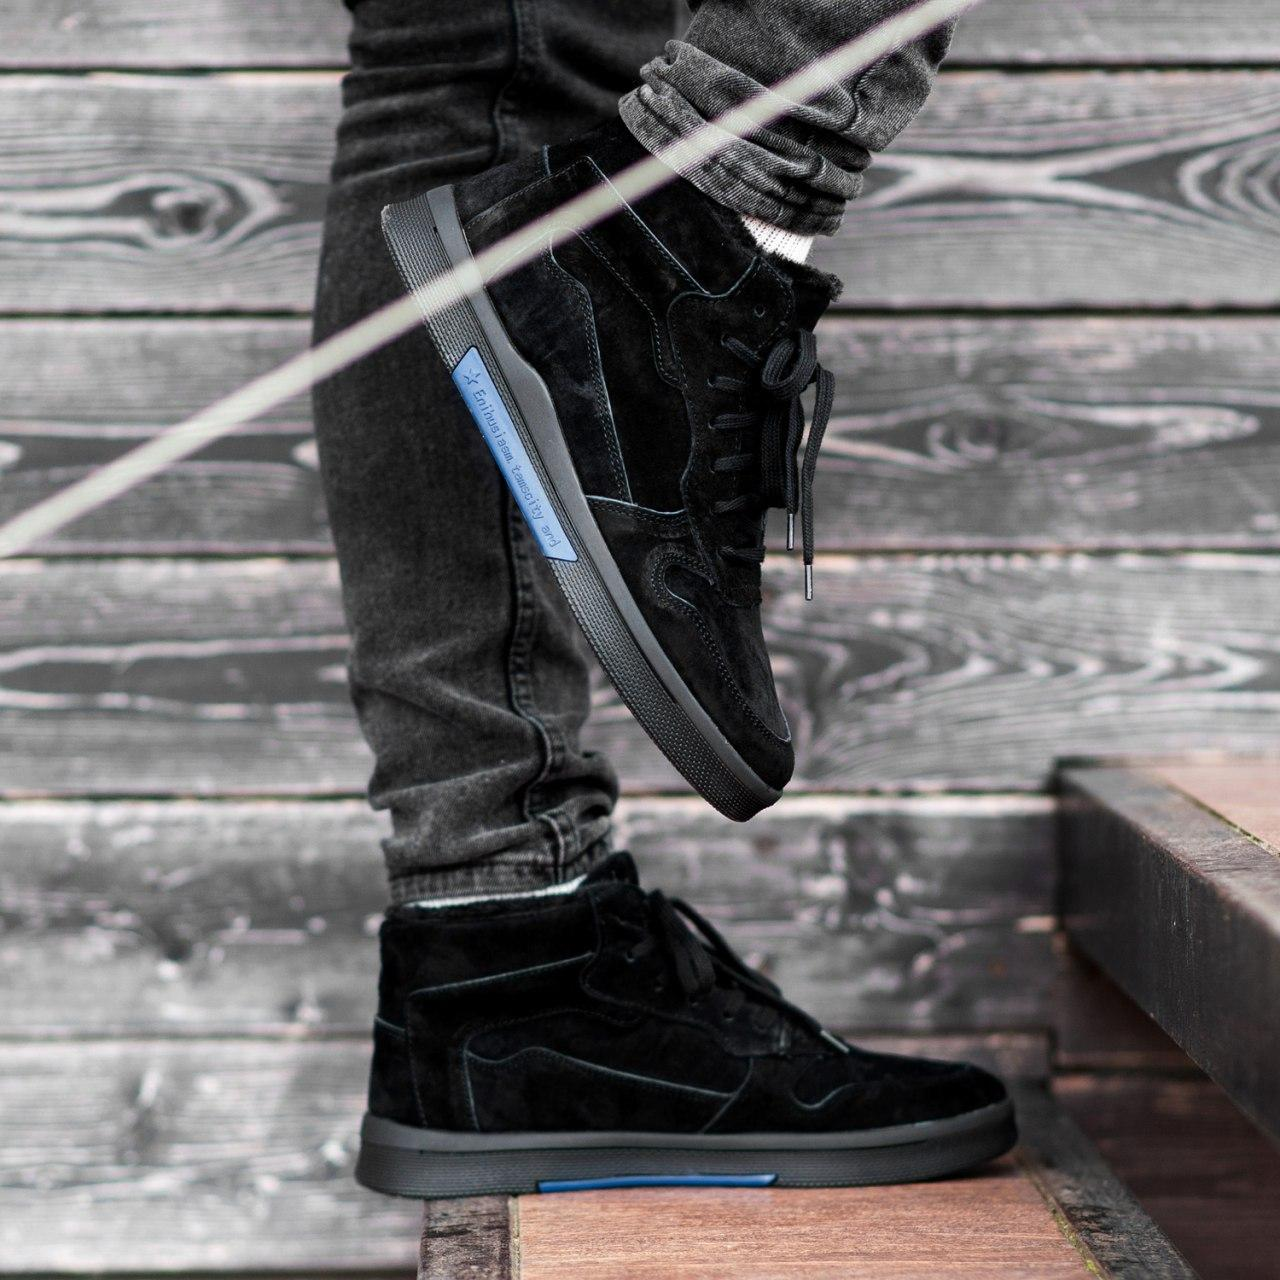 Ботинки South Oriole black - фото 1